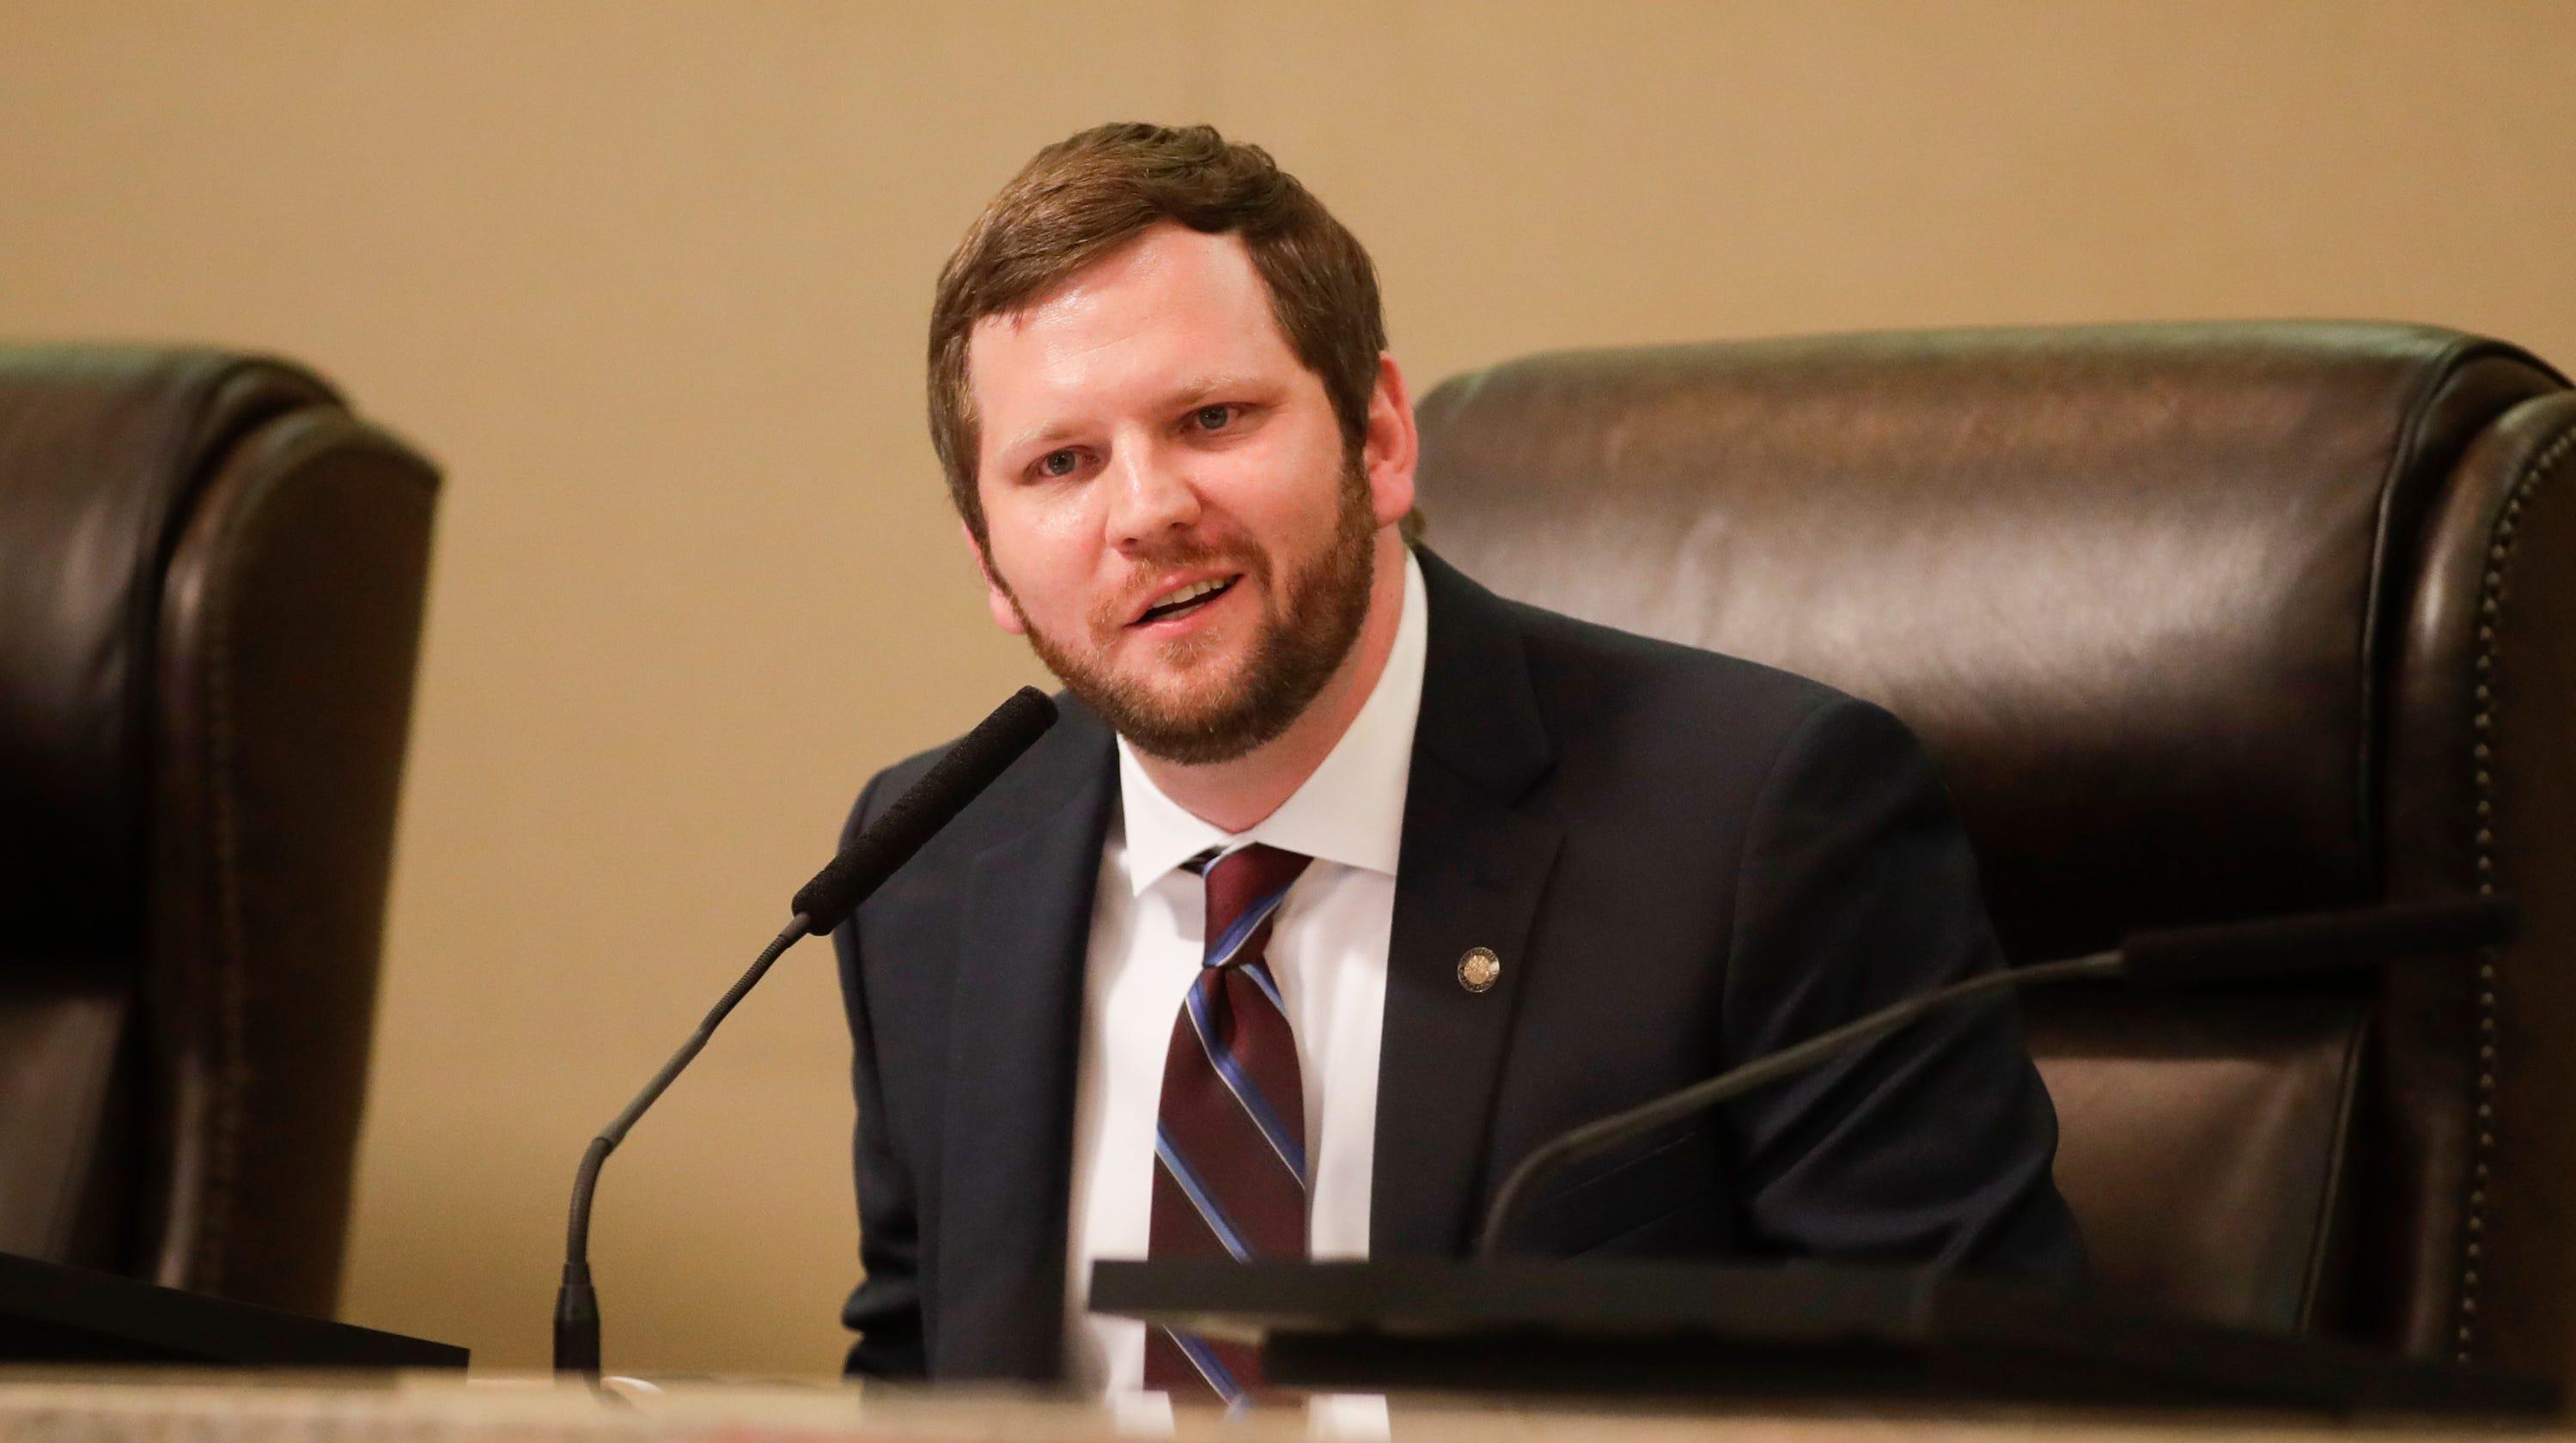 Digital divide as City Commission considers utility-managed fiber optics